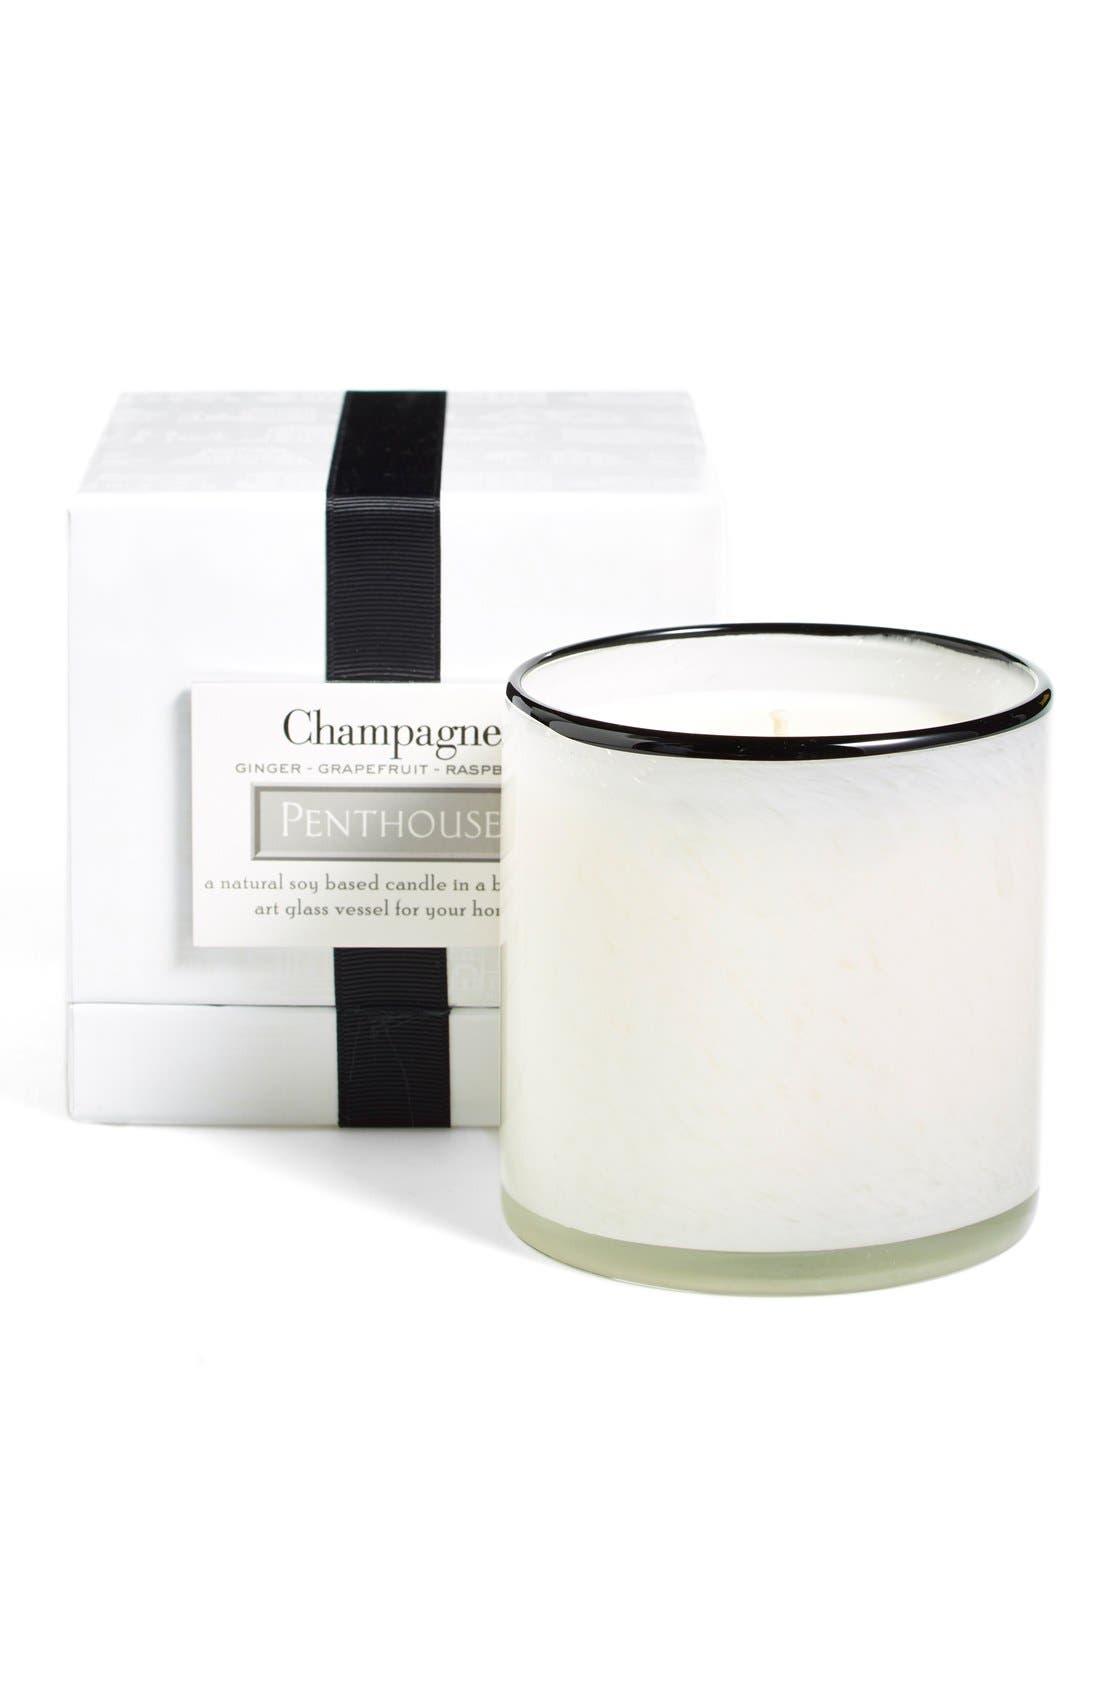 'Champagne - Penthouse' Candle,                             Alternate thumbnail 2, color,                             NO COLOR